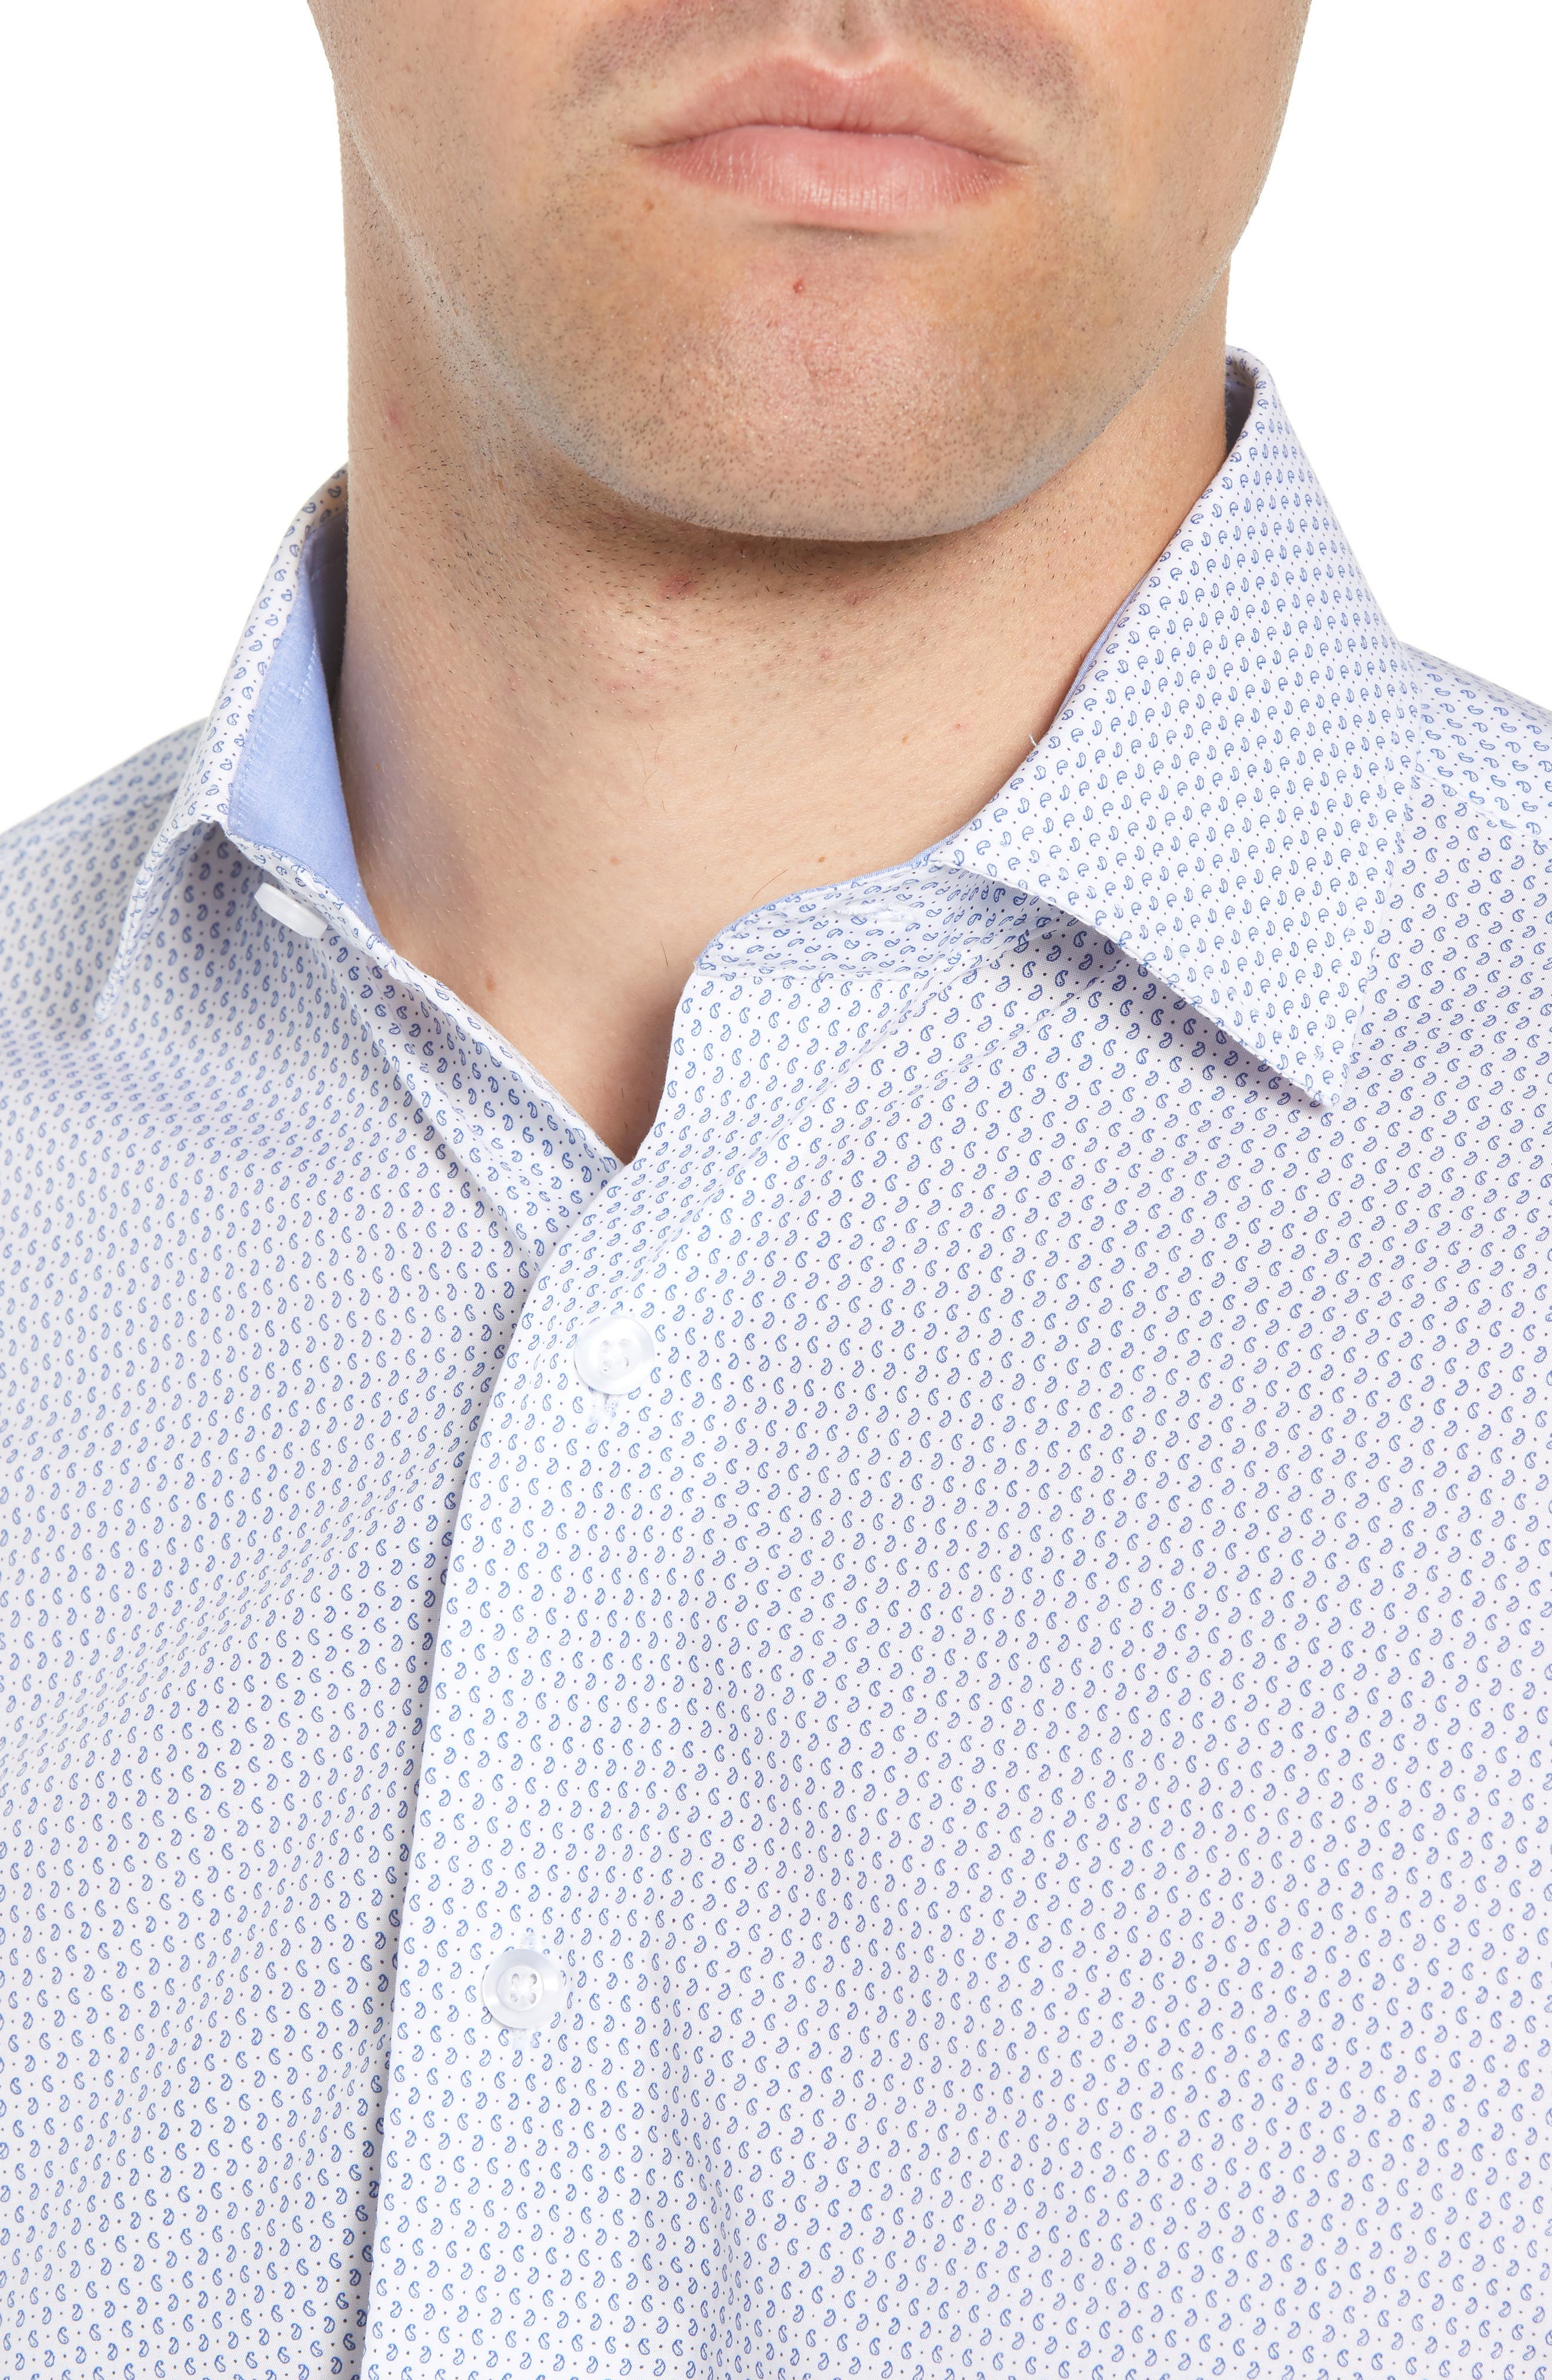 LORENZO UOMO,                             Trim Fit Paisley Dress Shirt,                             Alternate thumbnail 2, color,                             400